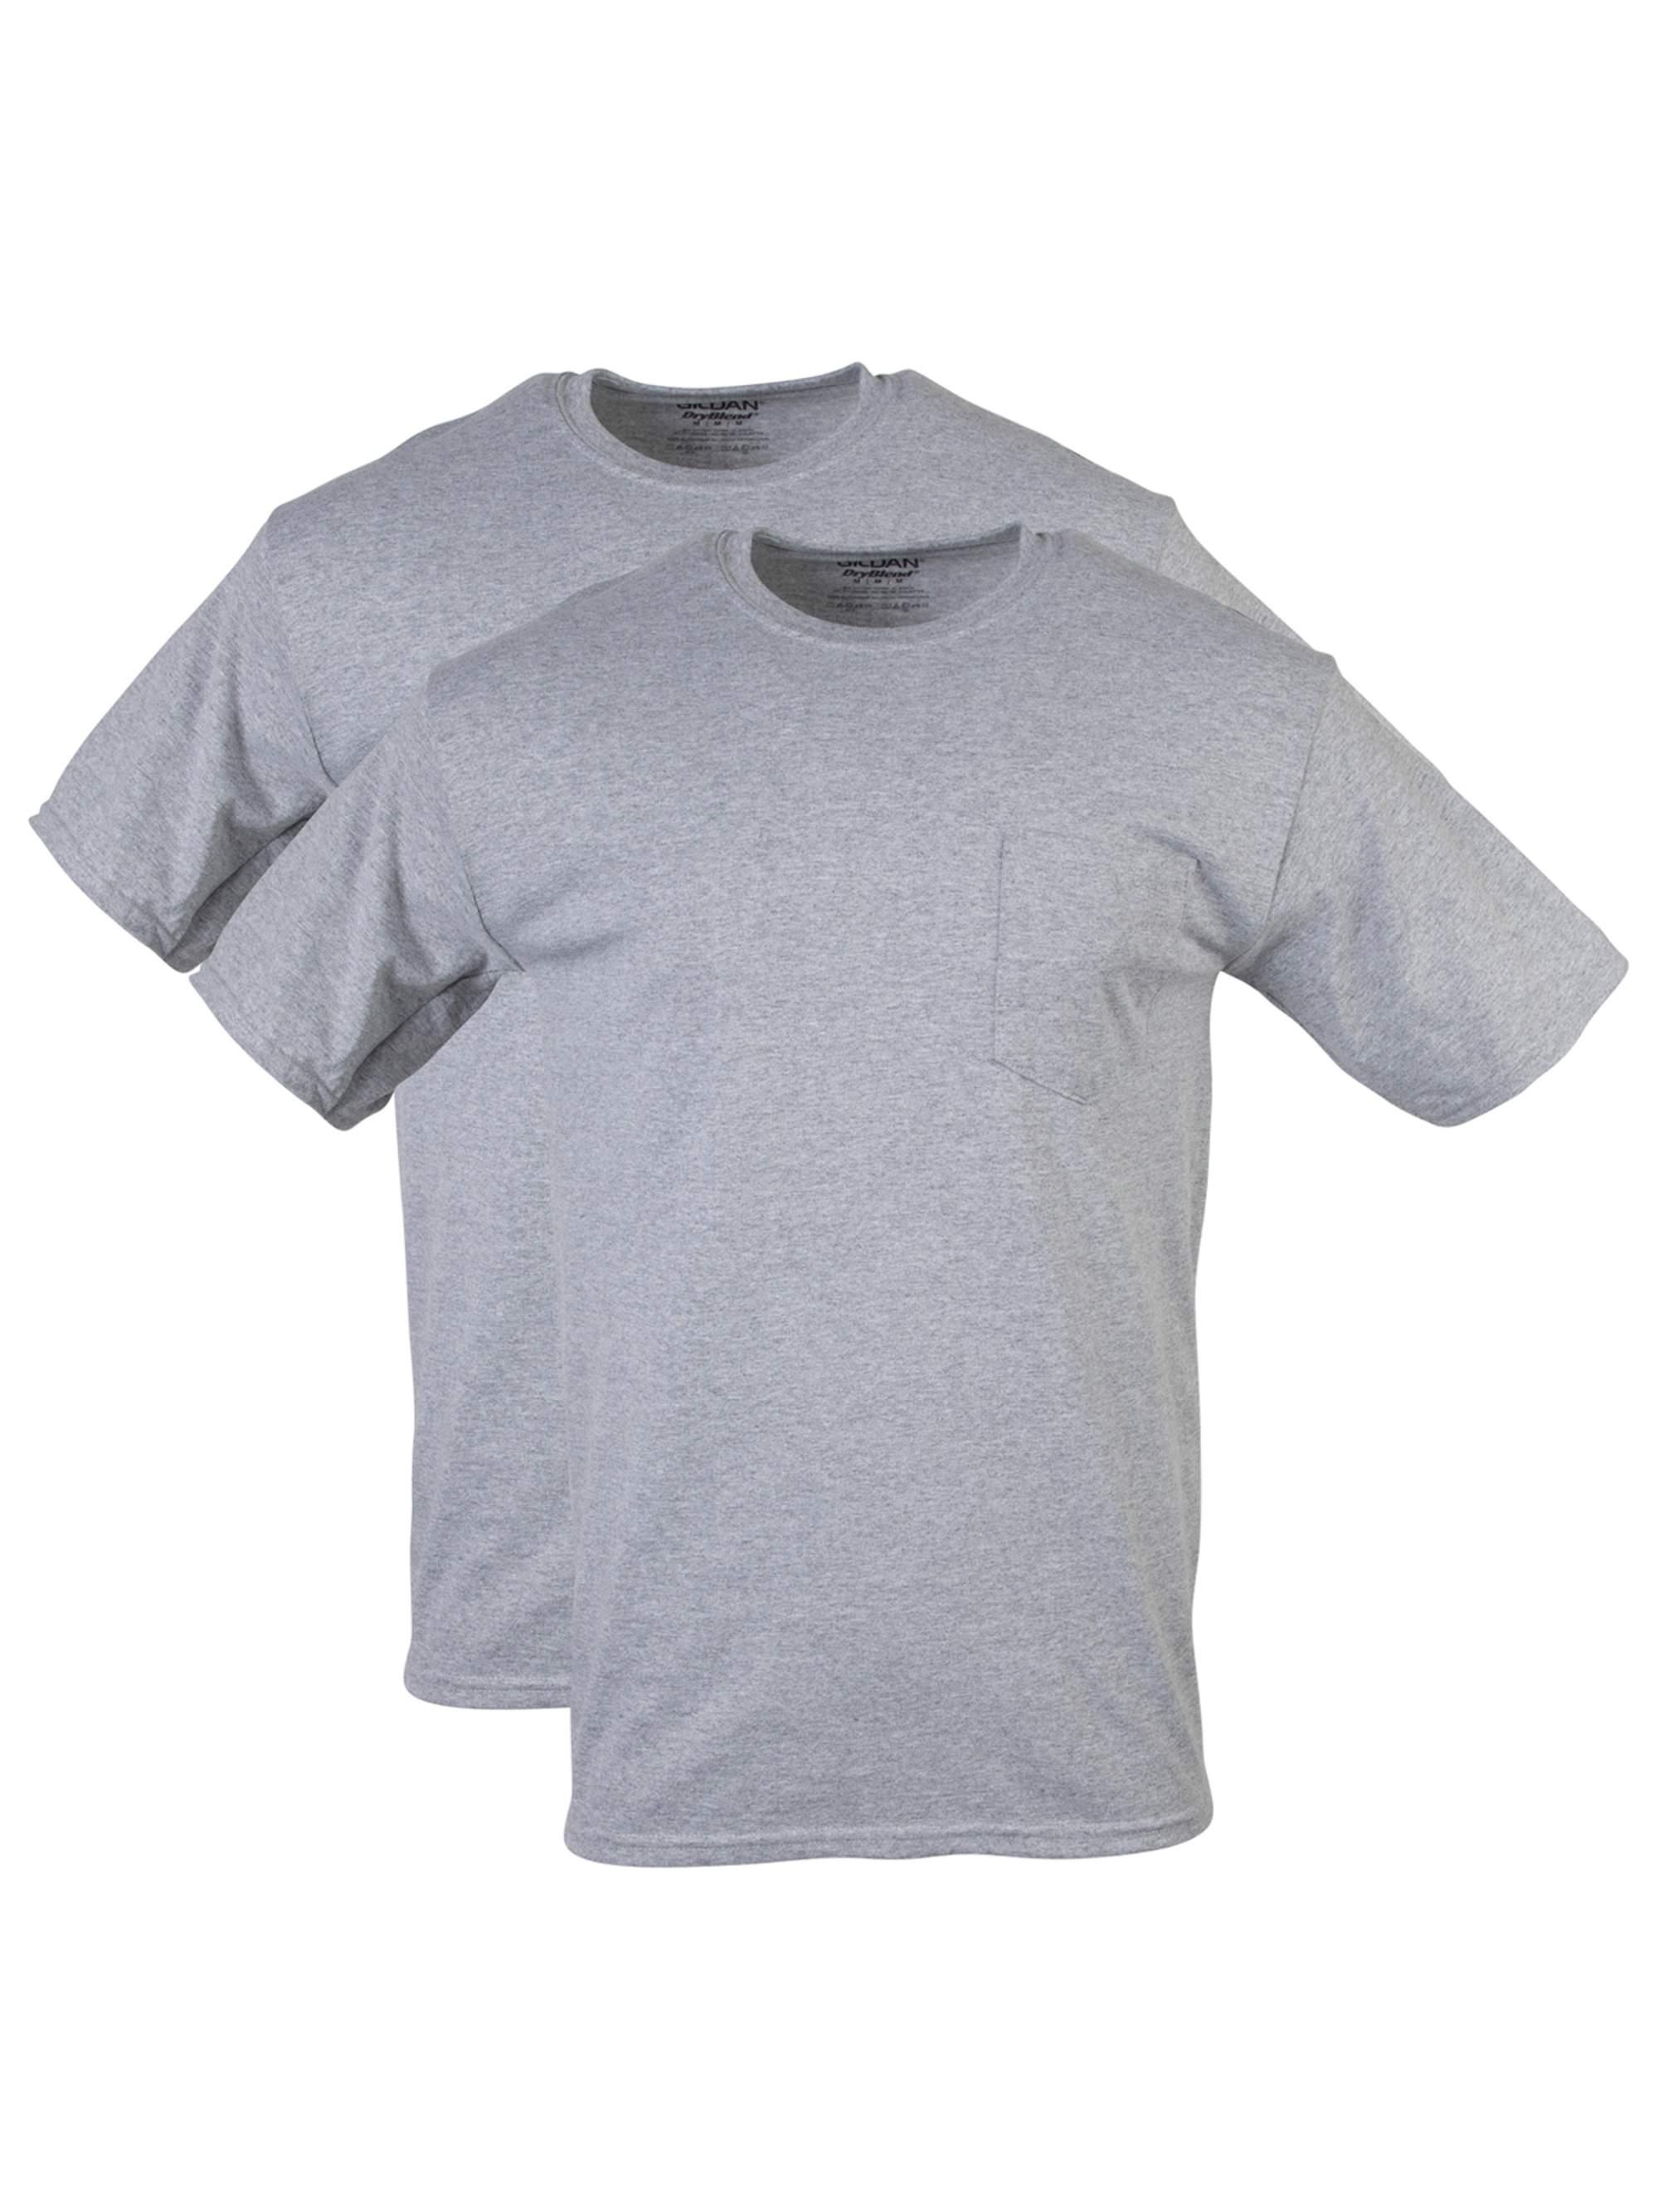 Gildan Men's DryBlend Workwear T-Shirts with Pocket, 2-Pack